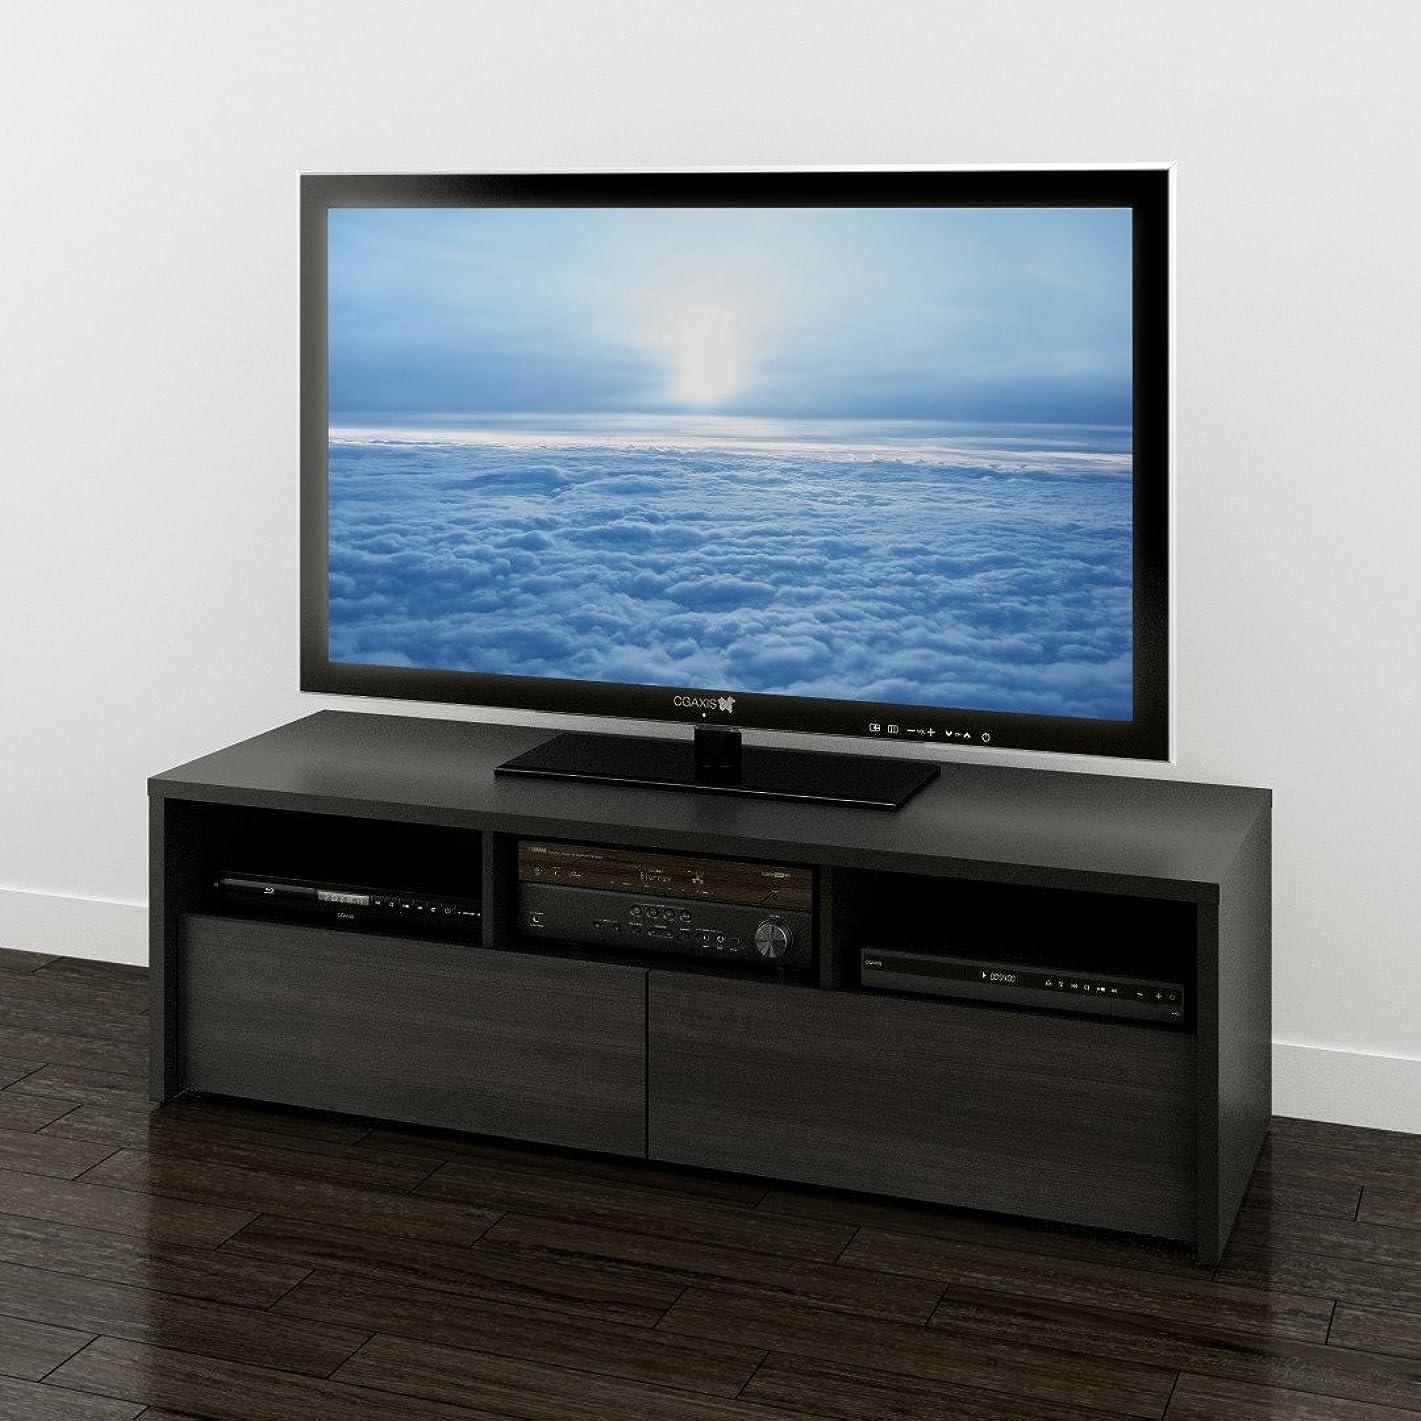 Sereni-T 60-inch TV Stand 210406 from Nexera, Black and Ebony